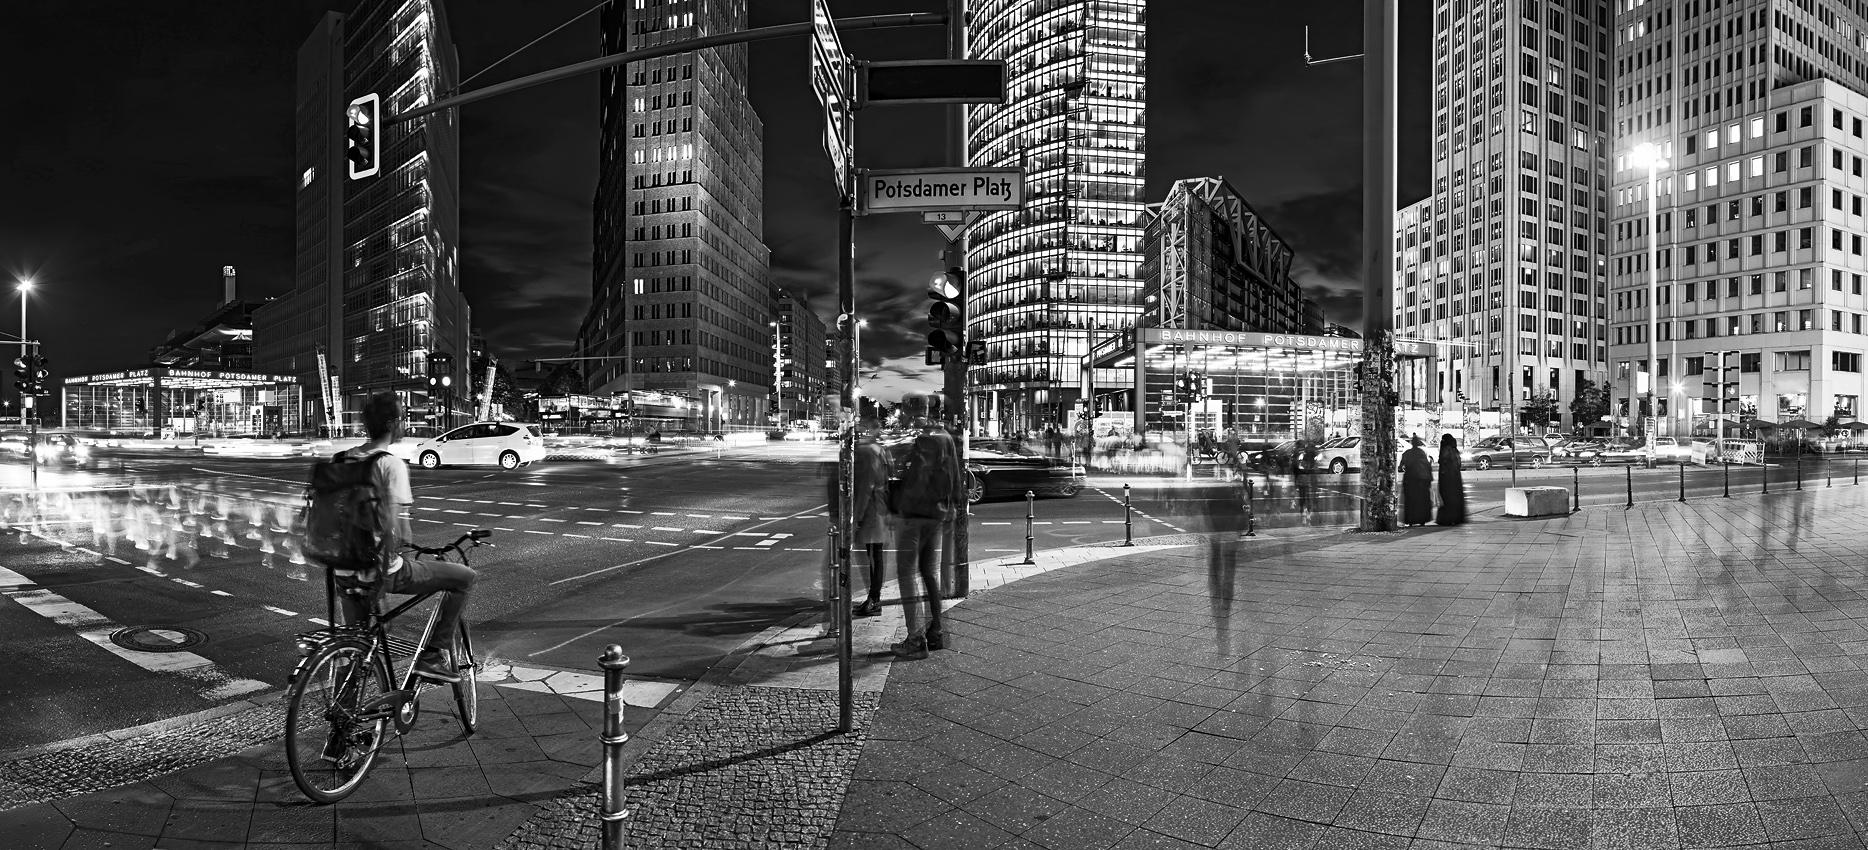 PotsPlatz_citylights_Pano1_SW_k